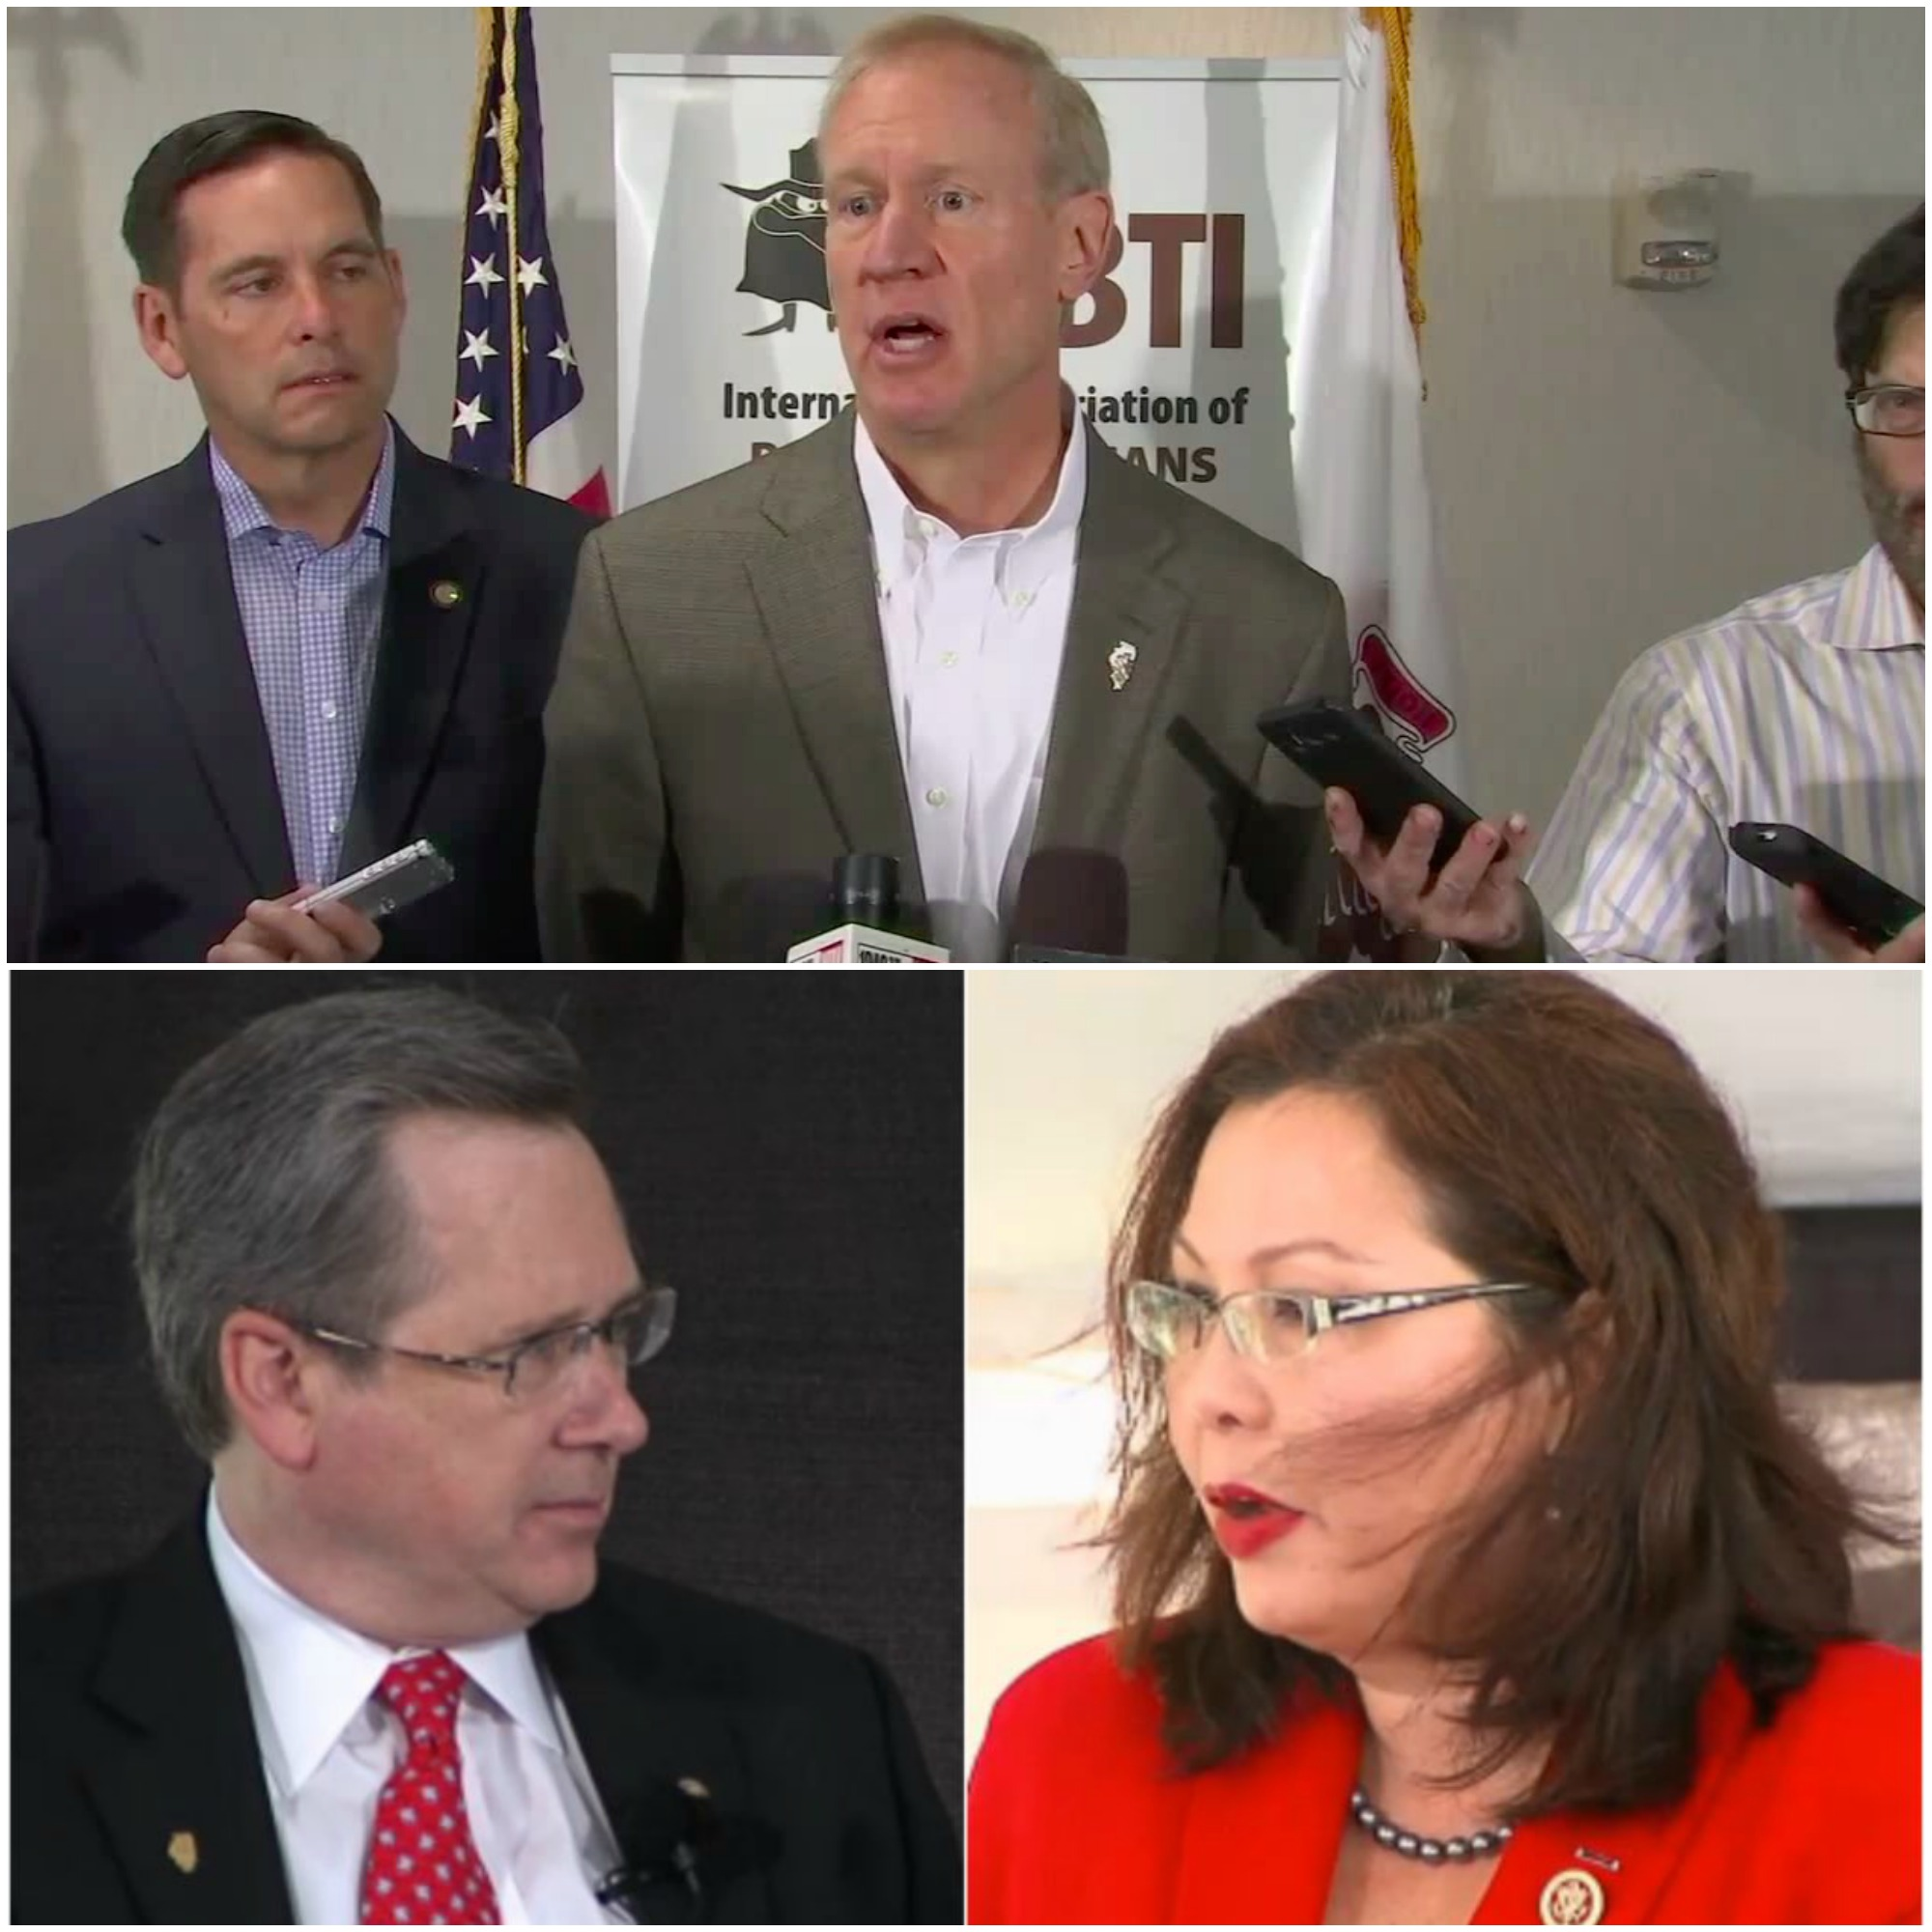 Clockwise from top: Illinois Gov. Bruce Rauner, U.S. Rep. Tammy Duckworth, U.S. Sen. Mark Kirk